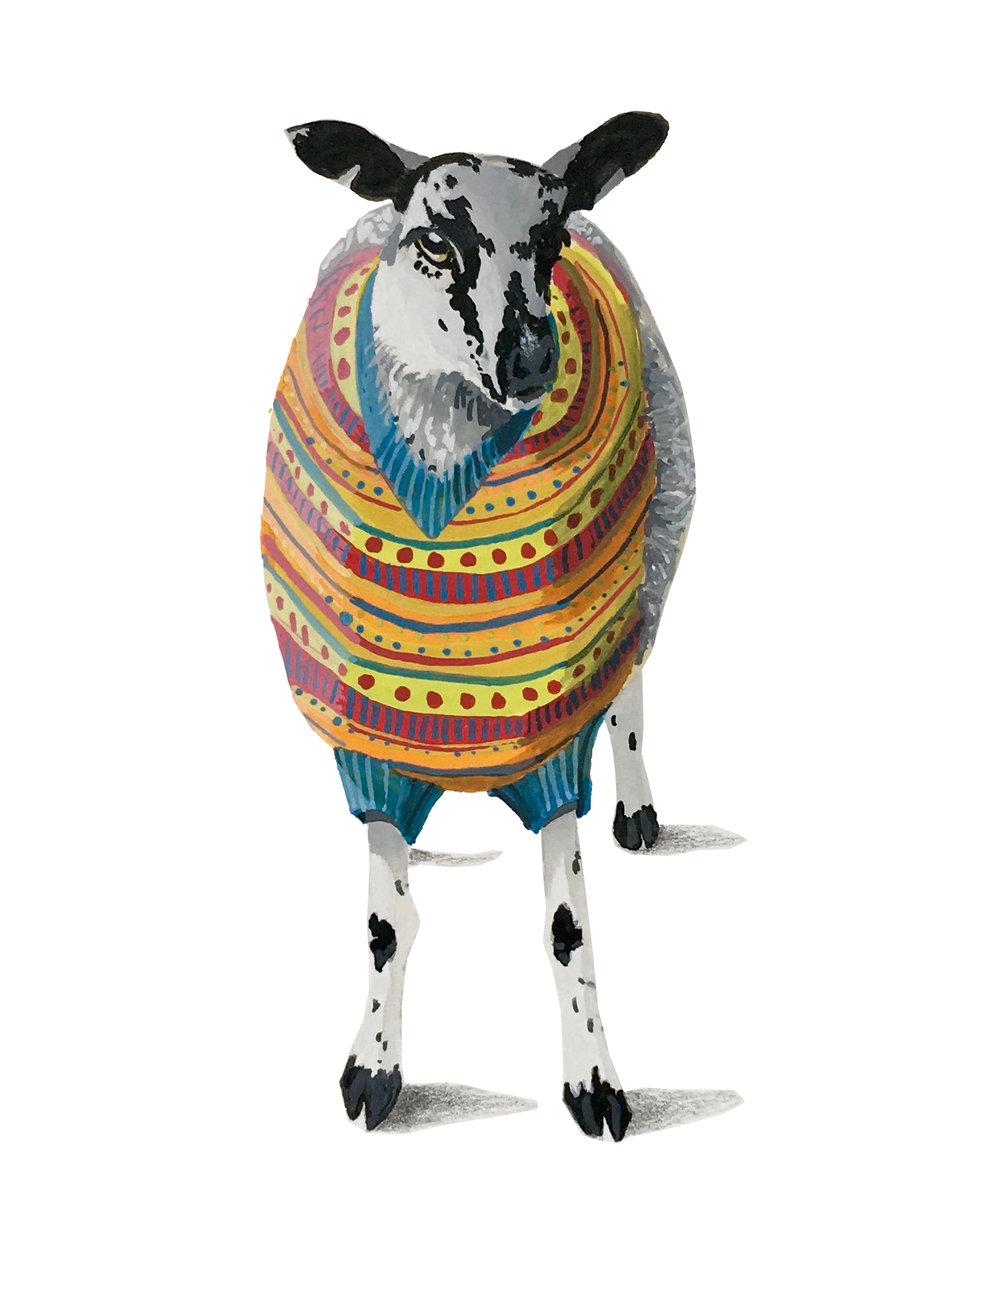 Ewe Look Lovely in That Jumper!